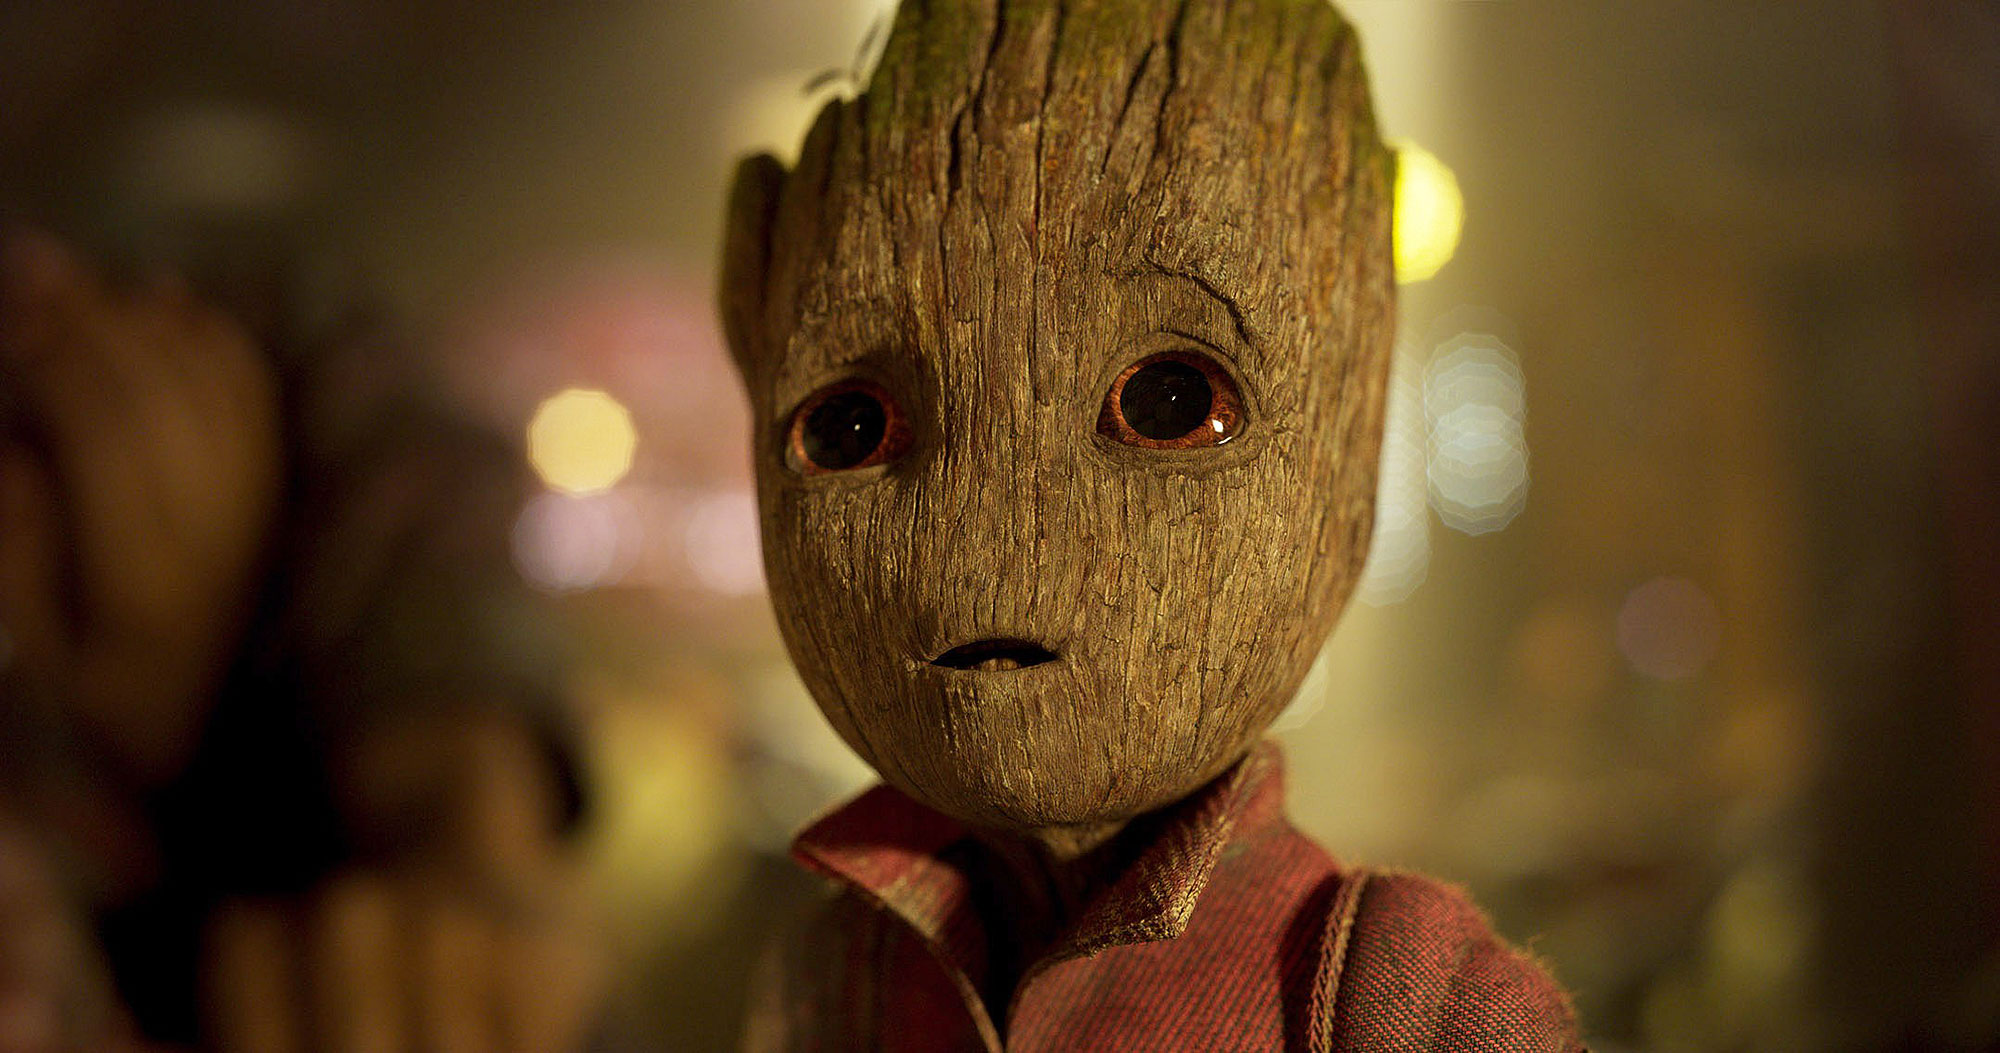 La dura verità su Baby Groot, James Gunn sorprende i fan